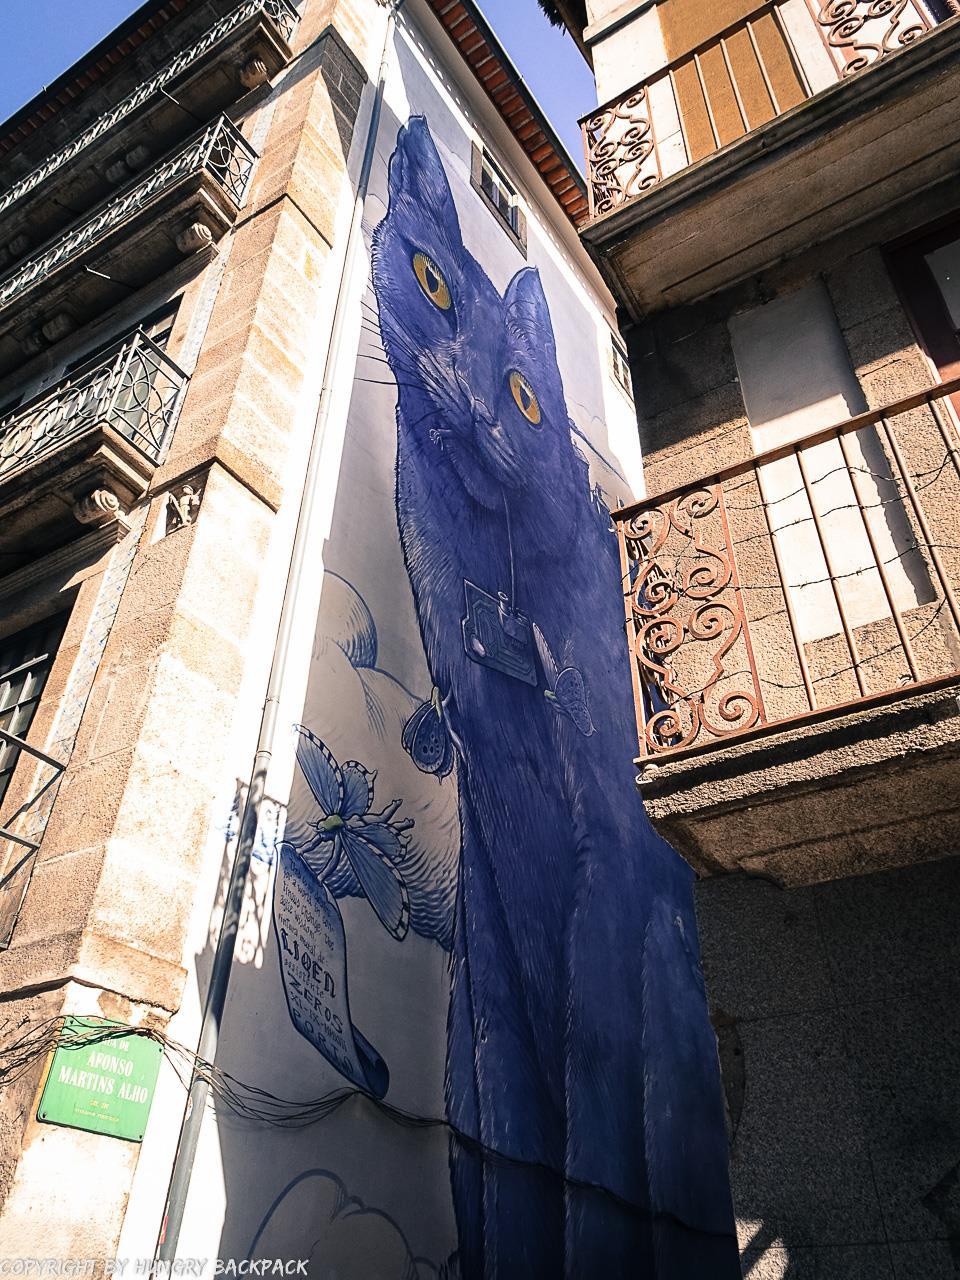 Porto street art_PERSPÉNTICO Blue Cat by LIQEN